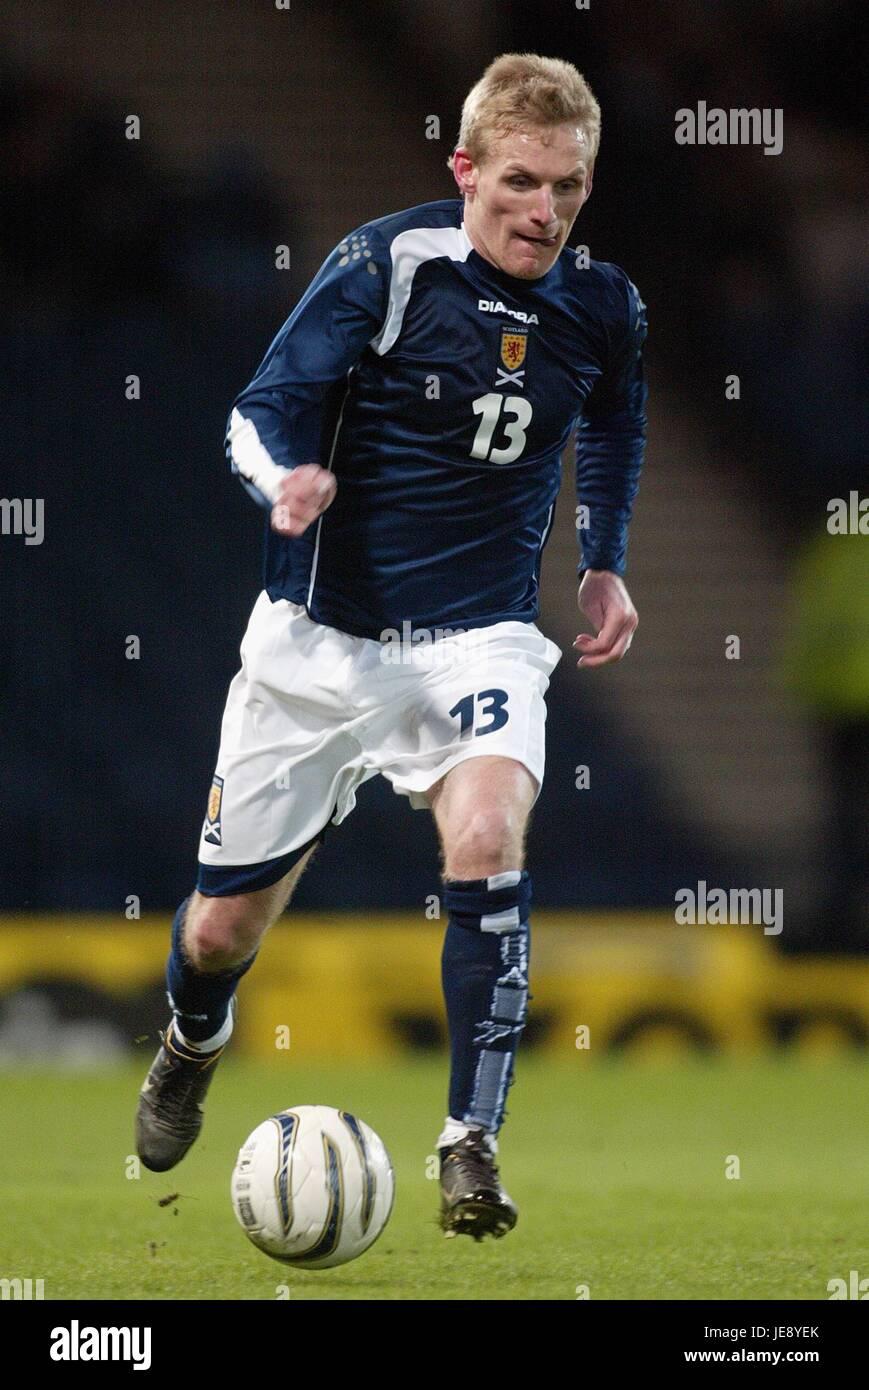 GARY TEALE SCOTLAND & WIGAN ATHLETIC FC HAMPDEN PARK GLASGOW SCOTLAND 01 March 2006 - Stock Image